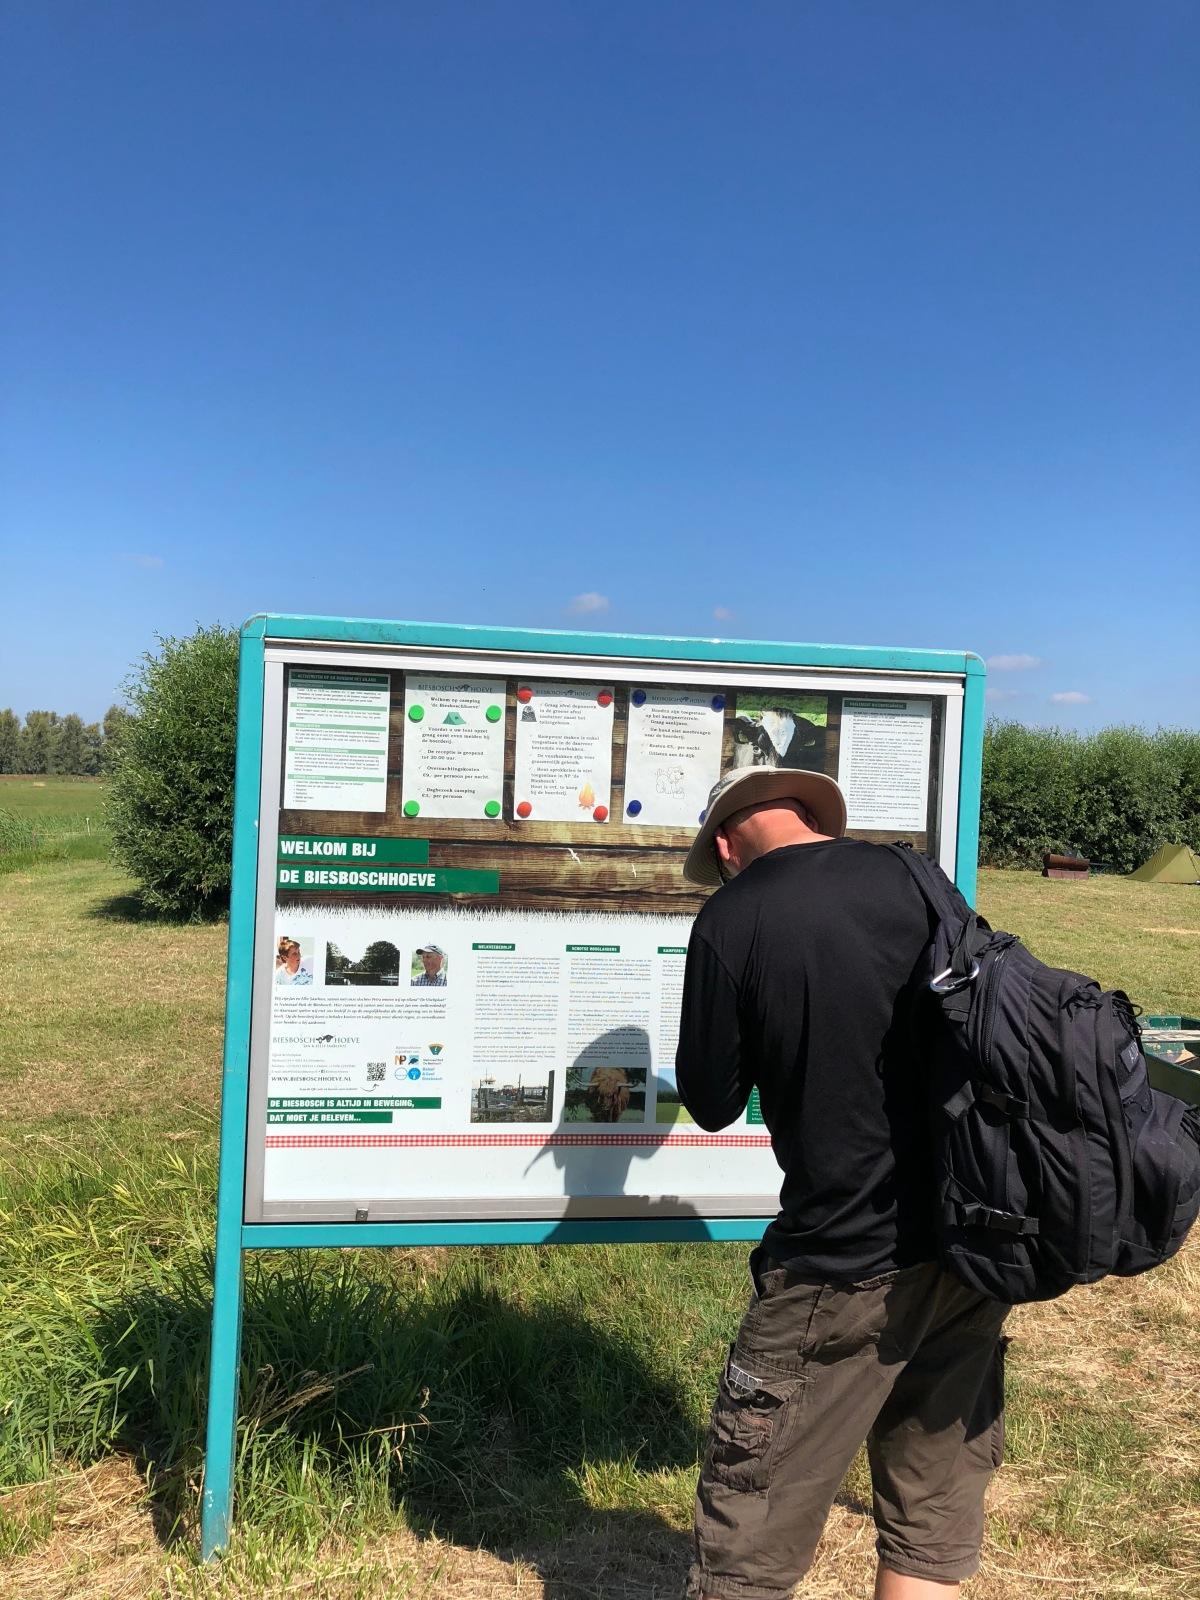 Information board for the Biesbosch Hoeve